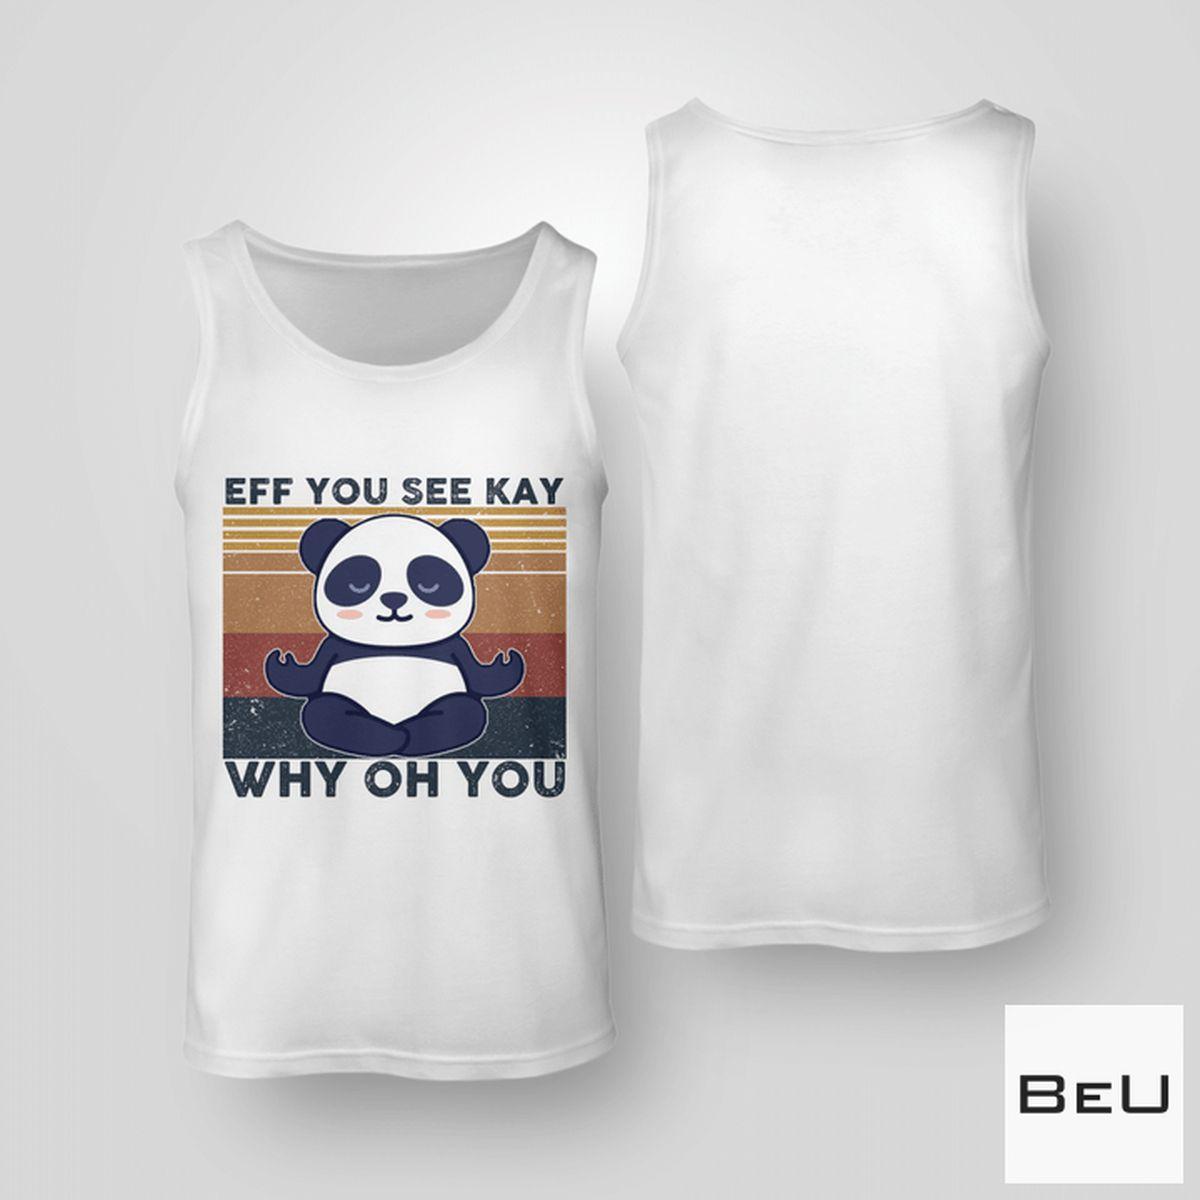 Unisex Eff You See Kay Why Oh You Panda Yoga Shirt, hoodie, tank top